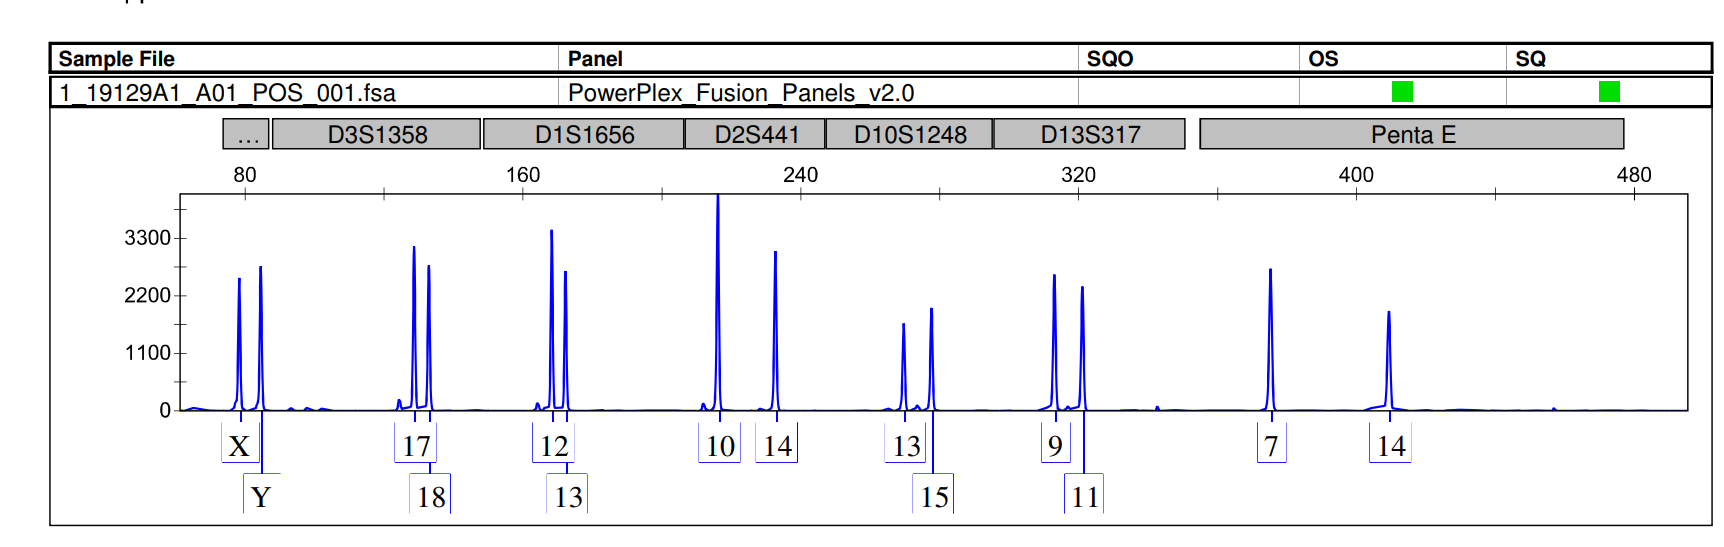 Example of an electropherogram